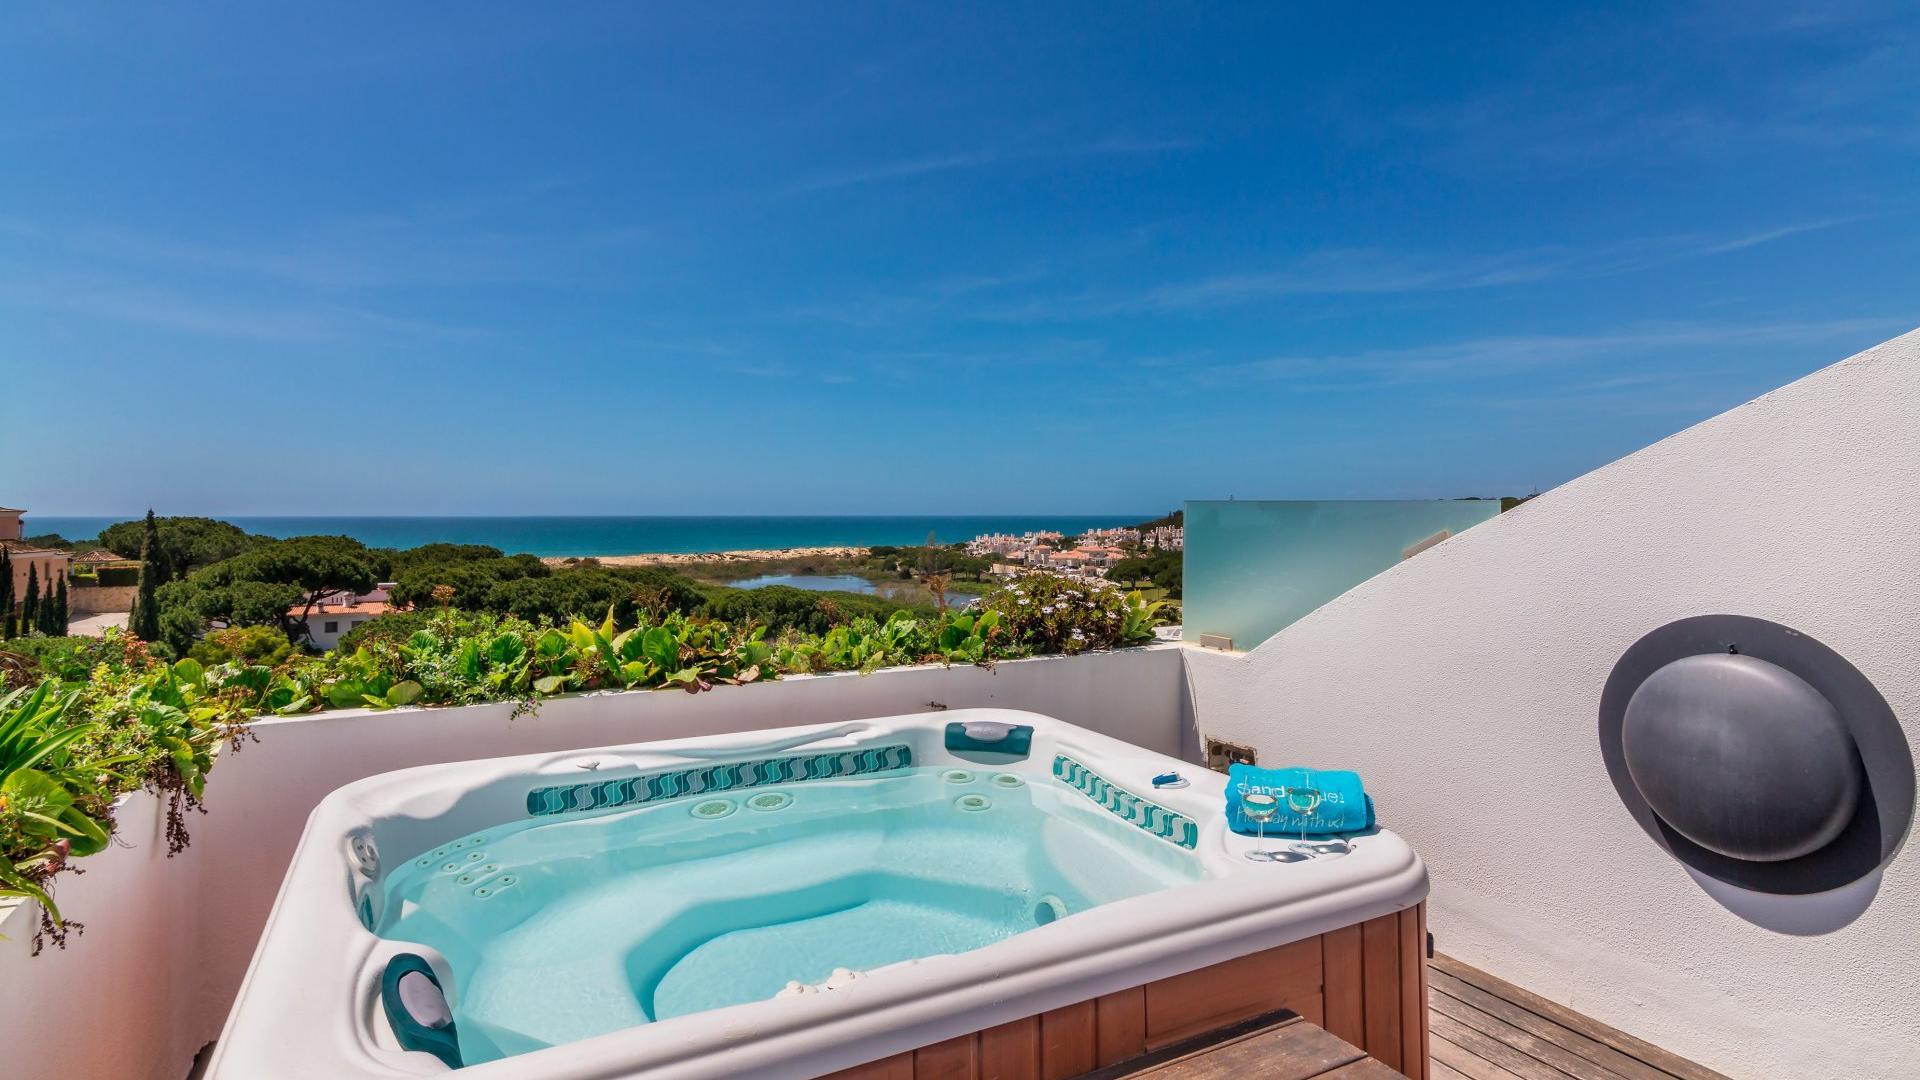 Apartment Sea View - Vale do Lobo, Algarve - 16.jpg